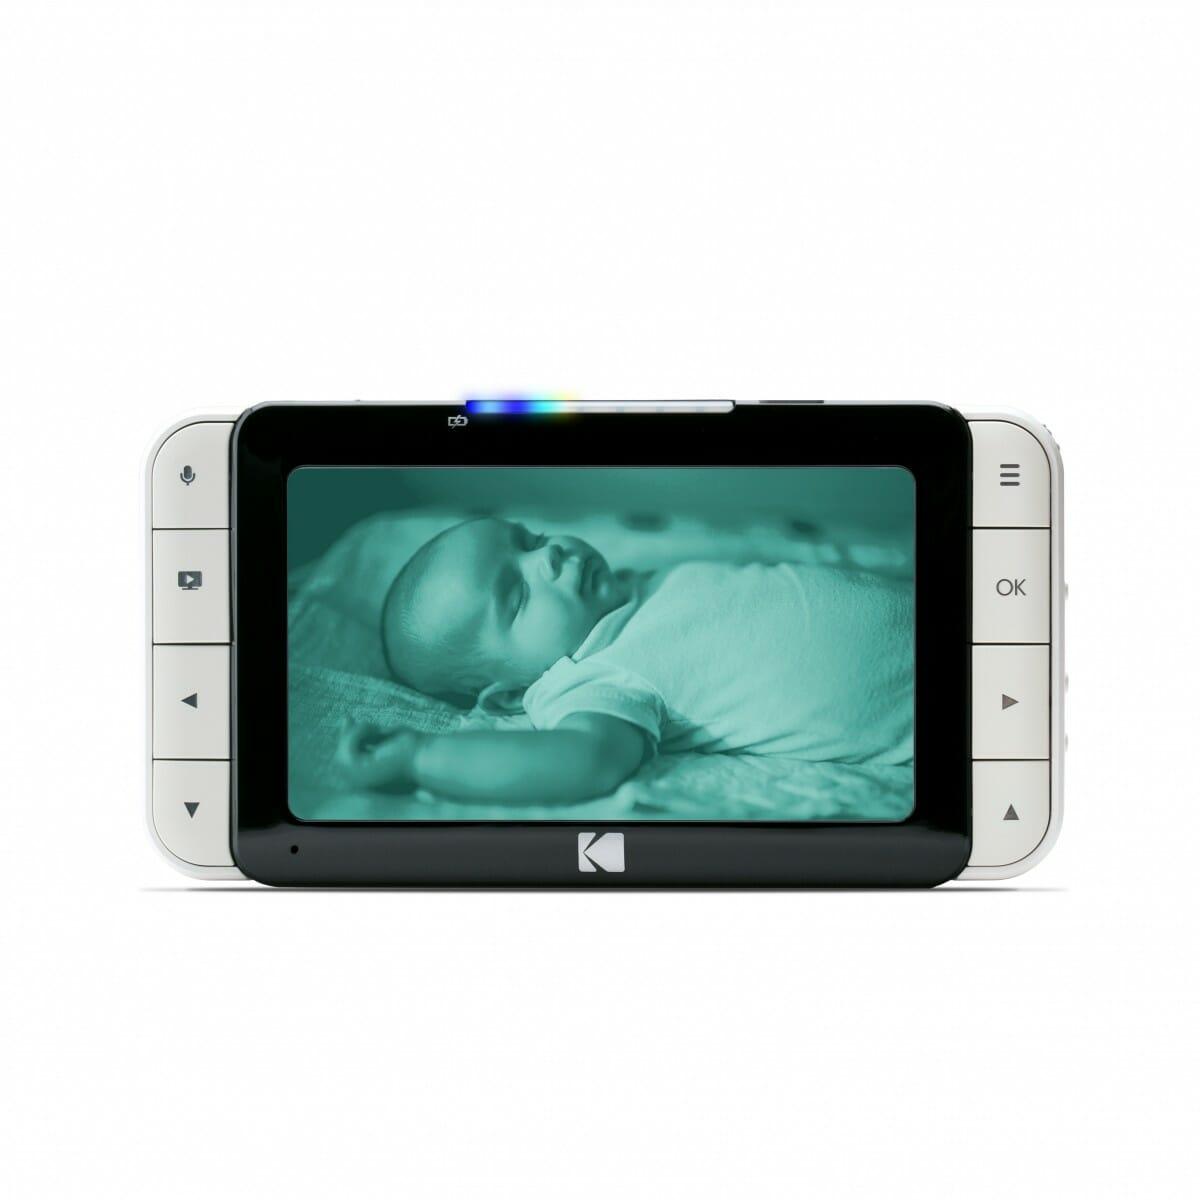 Kodak Smarthome Baby Monitor 5 Night Vision C525